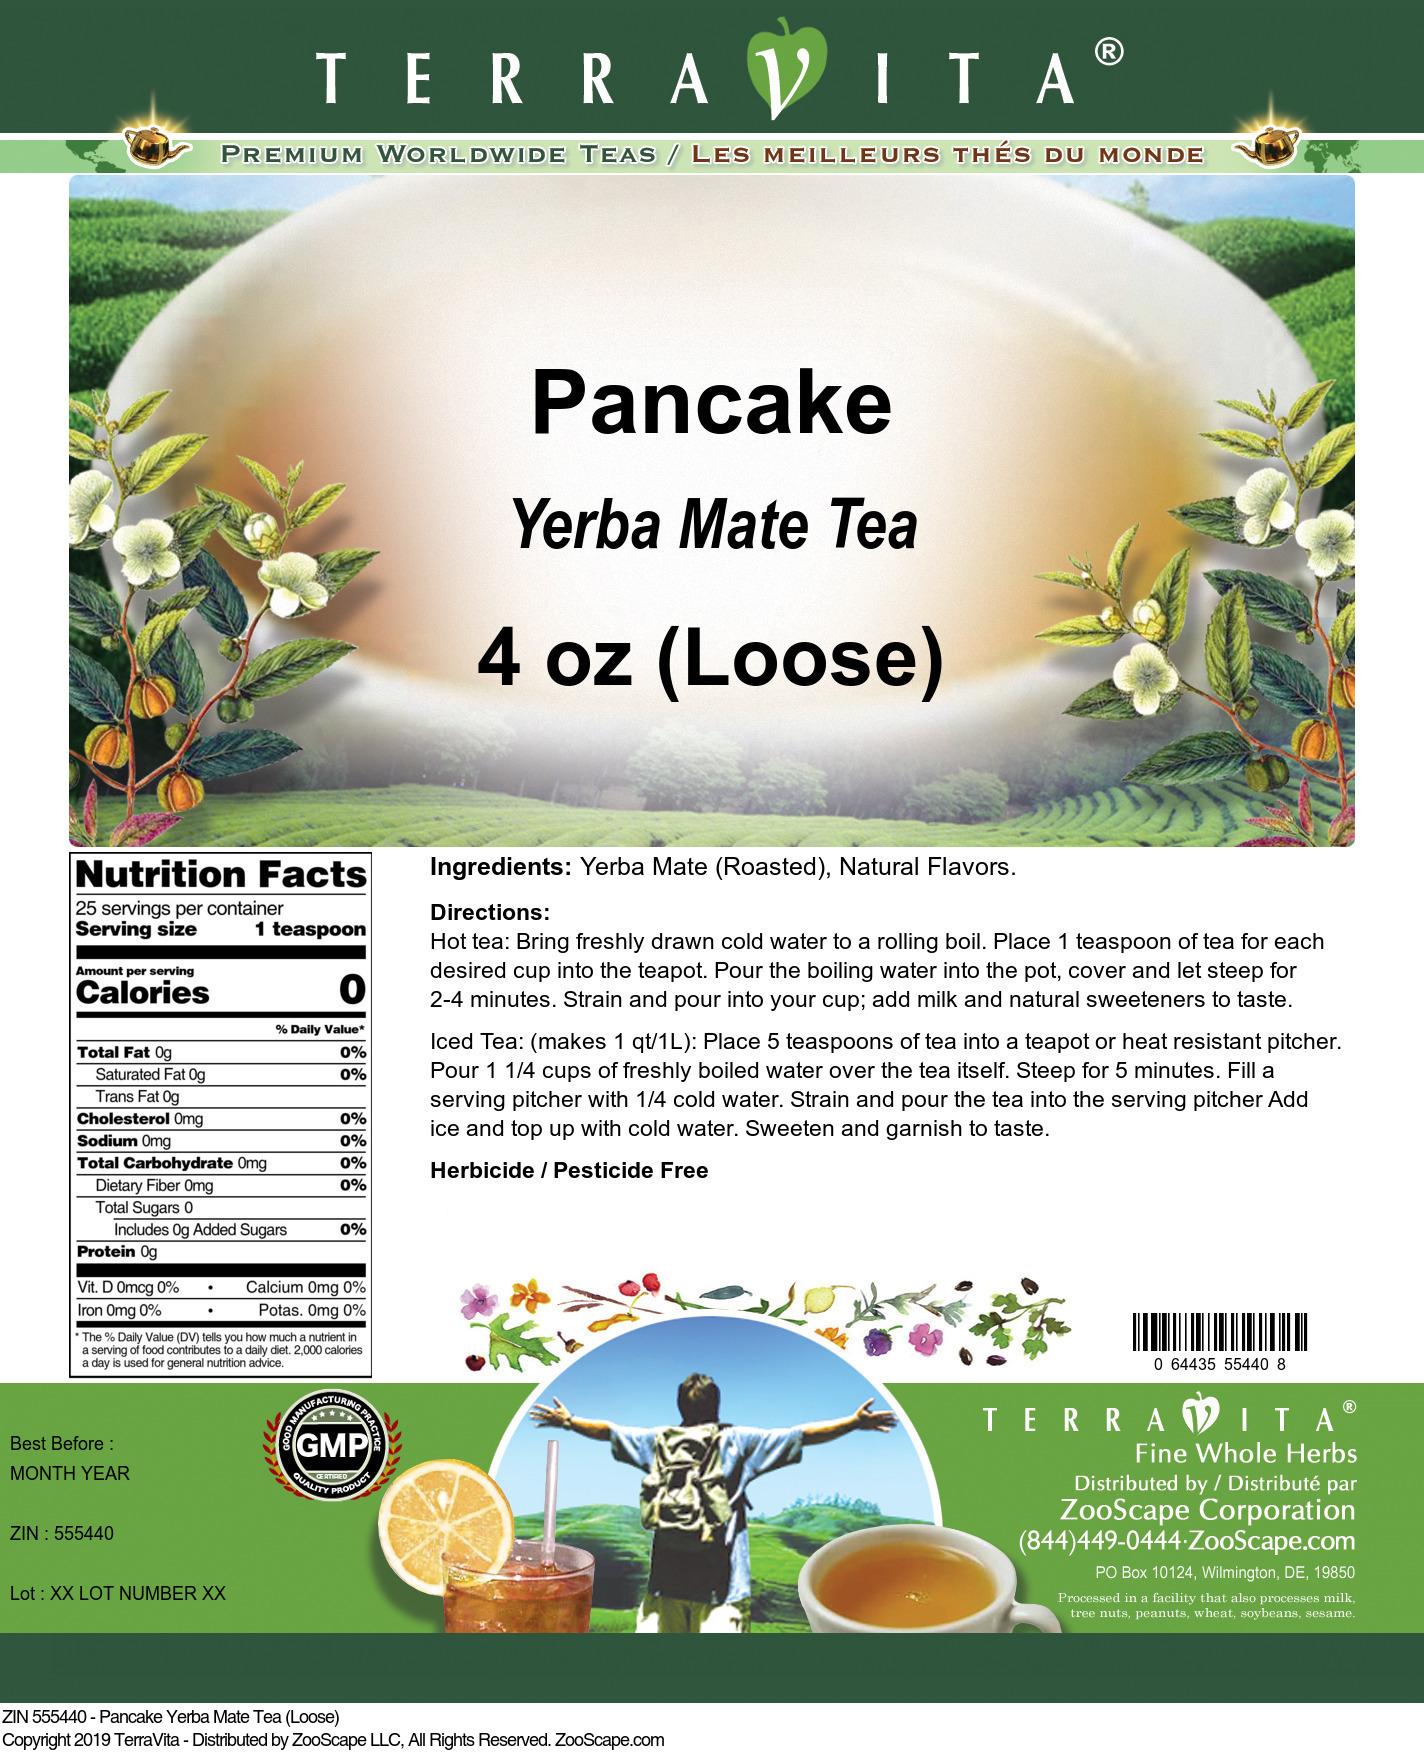 Pancake Yerba Mate Tea (Loose)